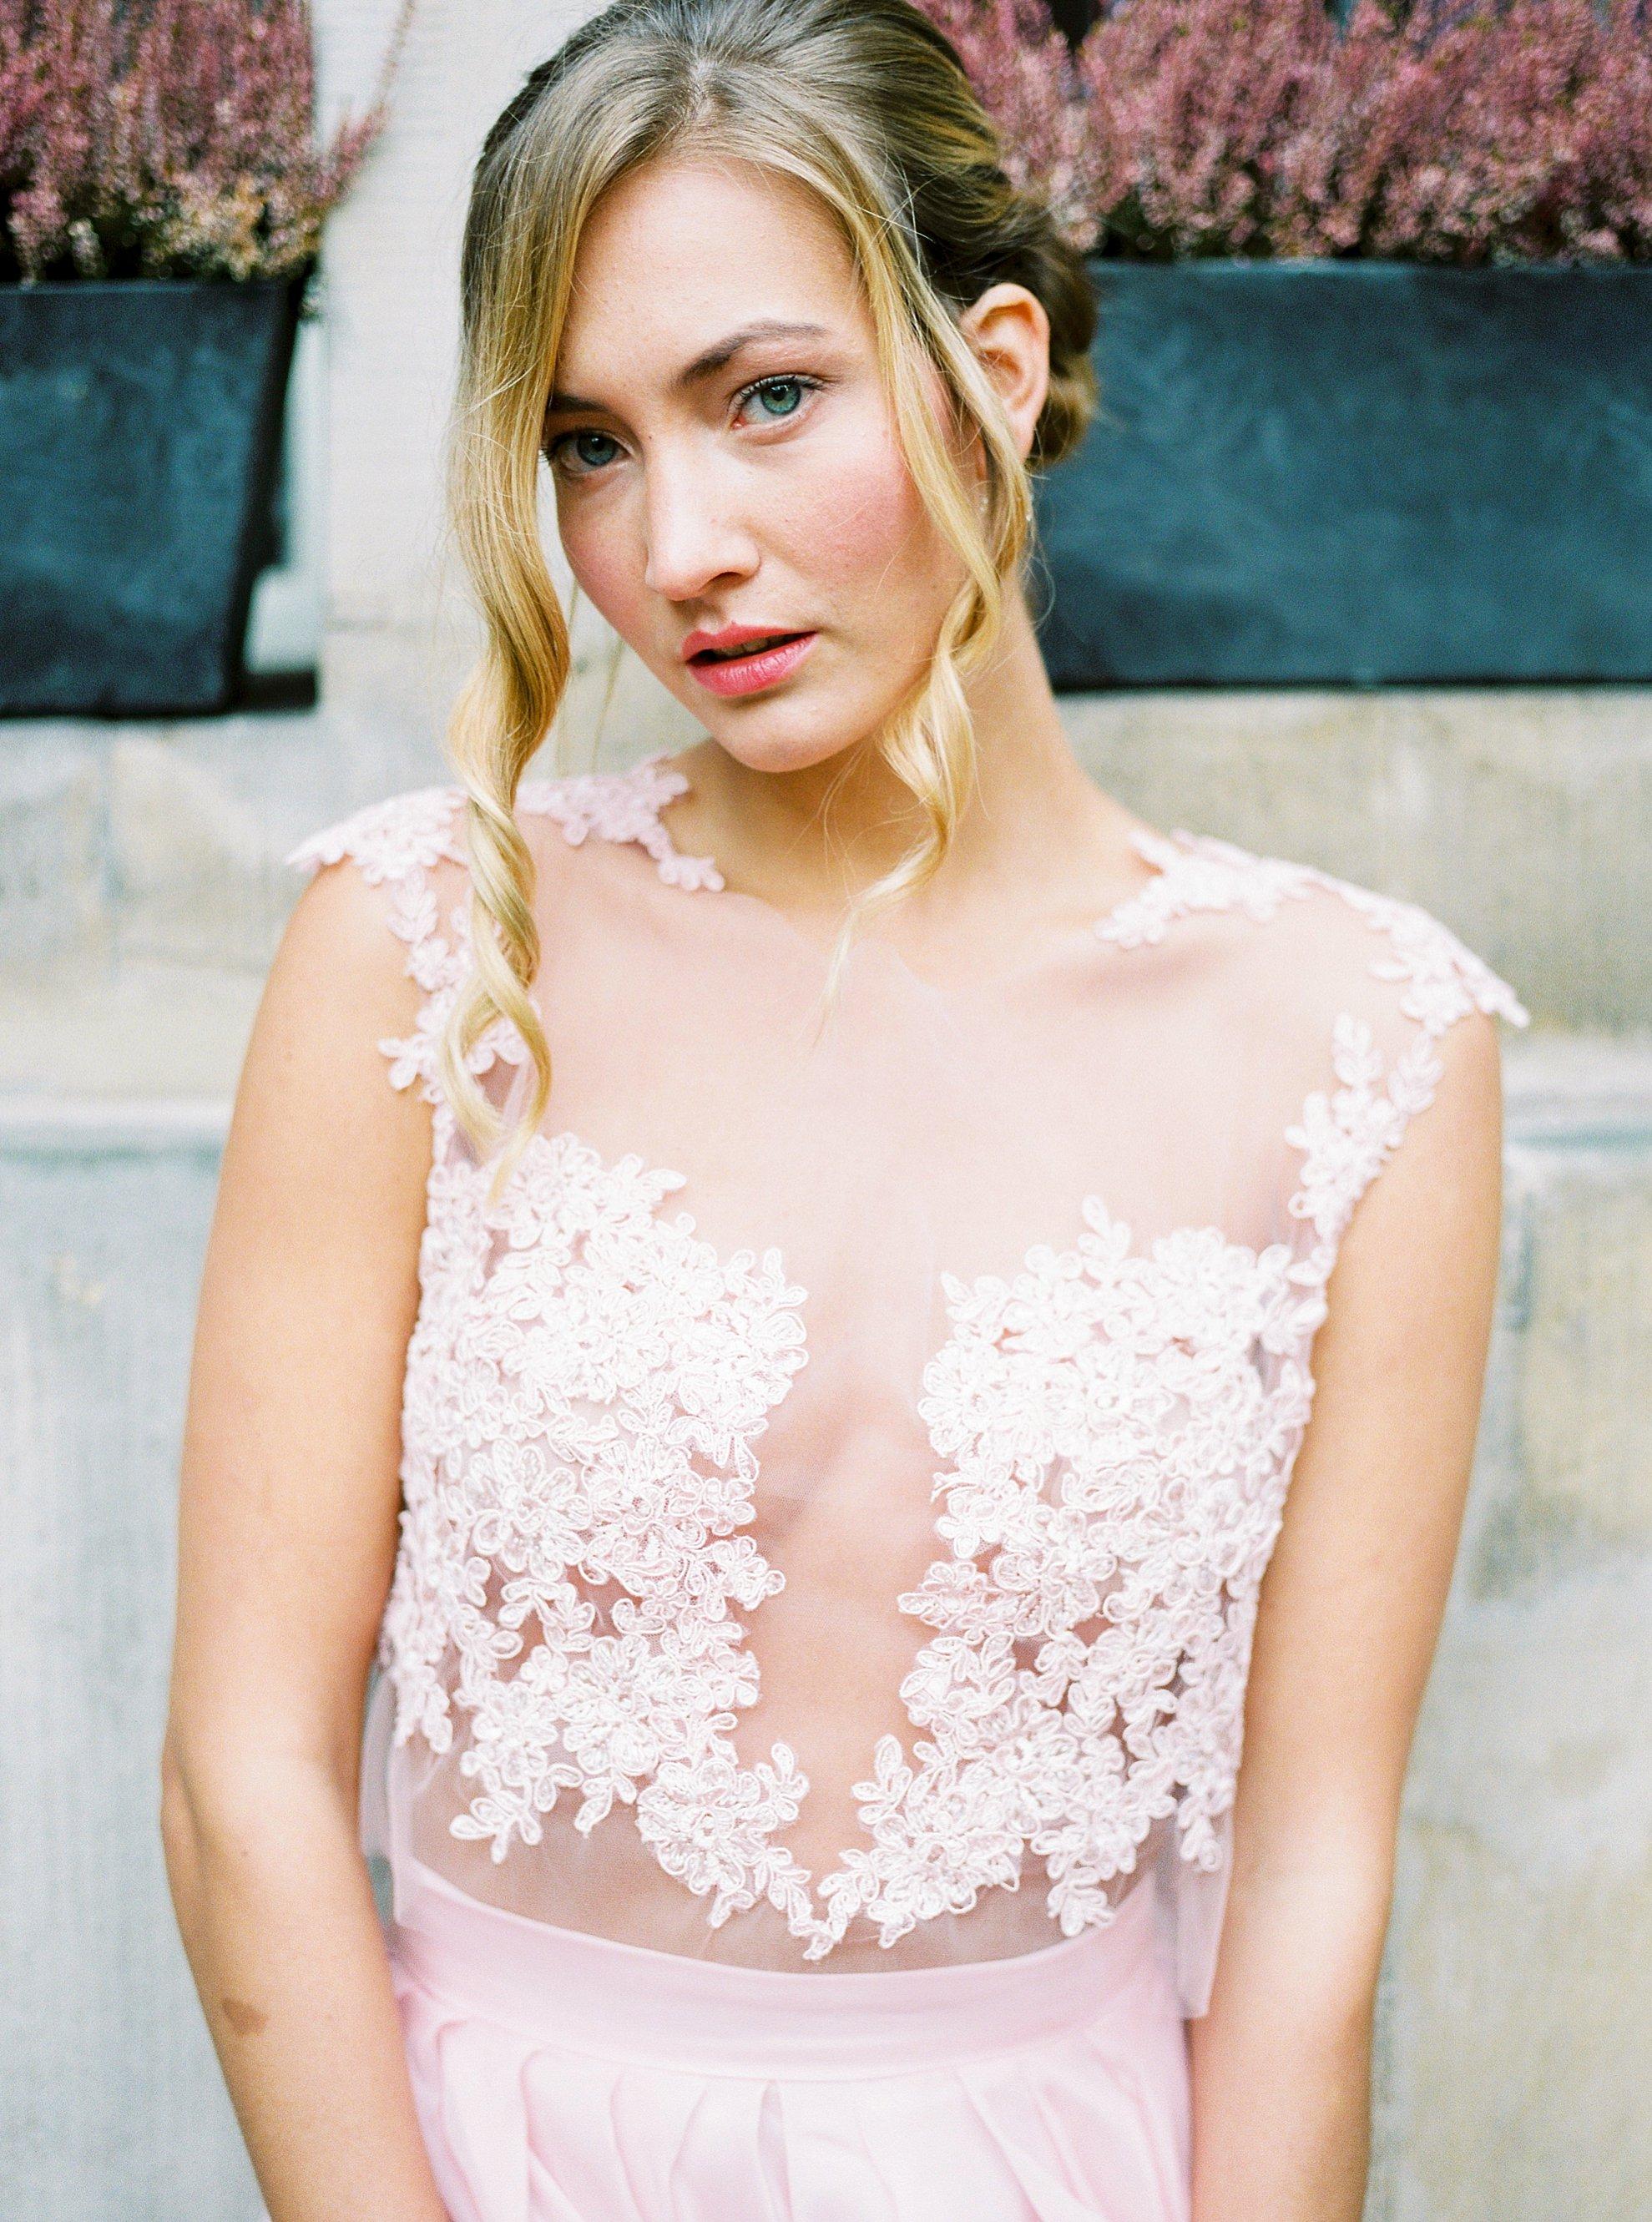 Amanda-Drost-Photography-fotografie-bruiloft-trouwen-winter-TheNetherlands_0076.jpg